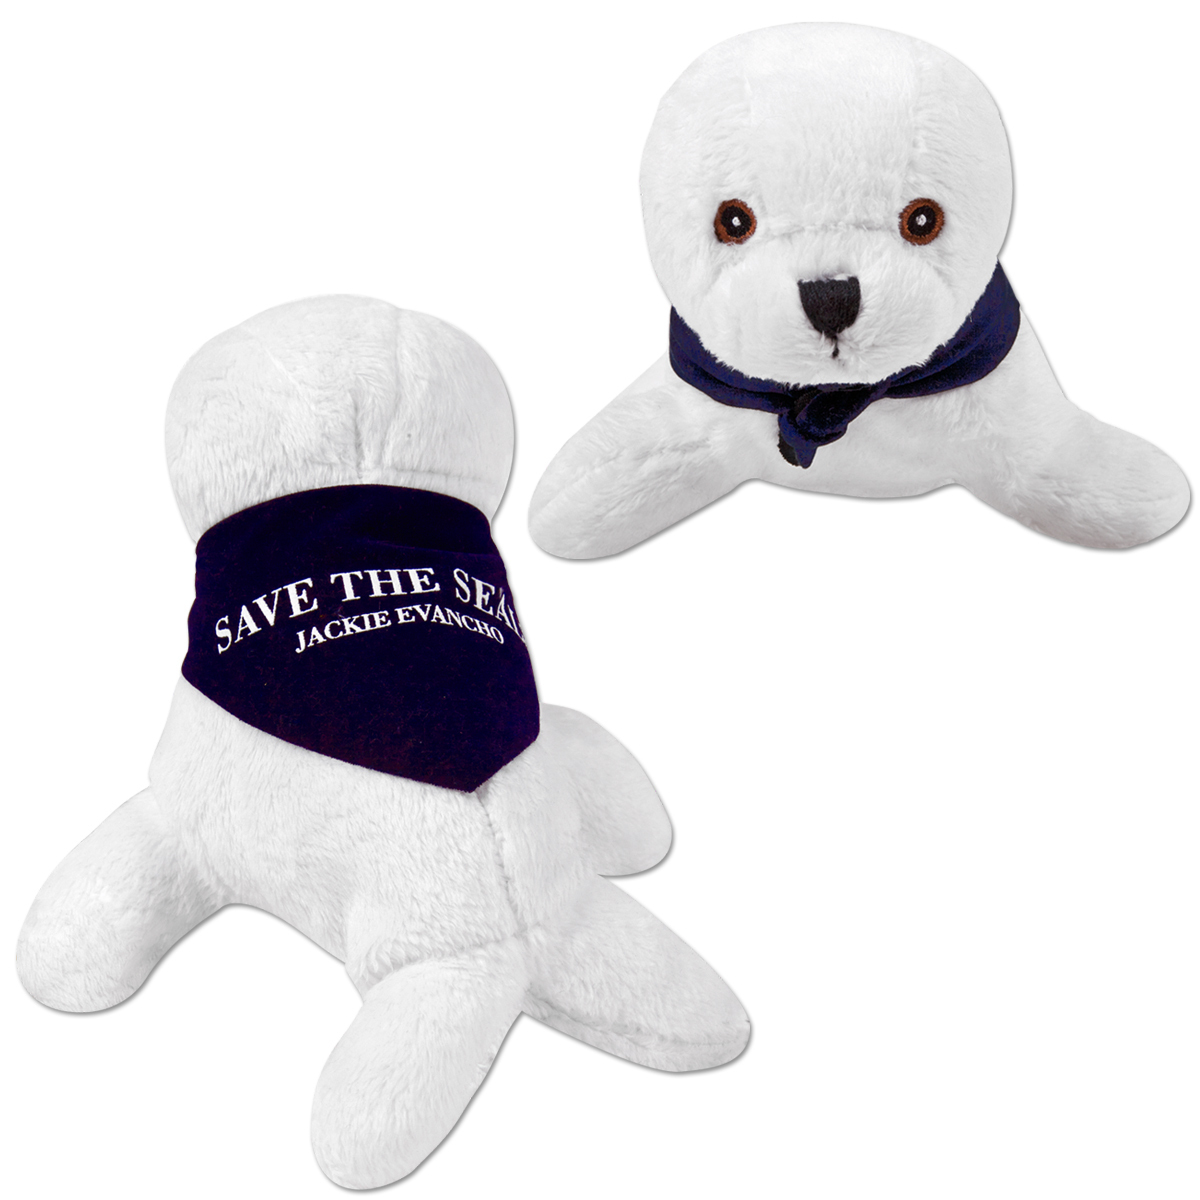 Jackie Evancho Baby Seal Plush